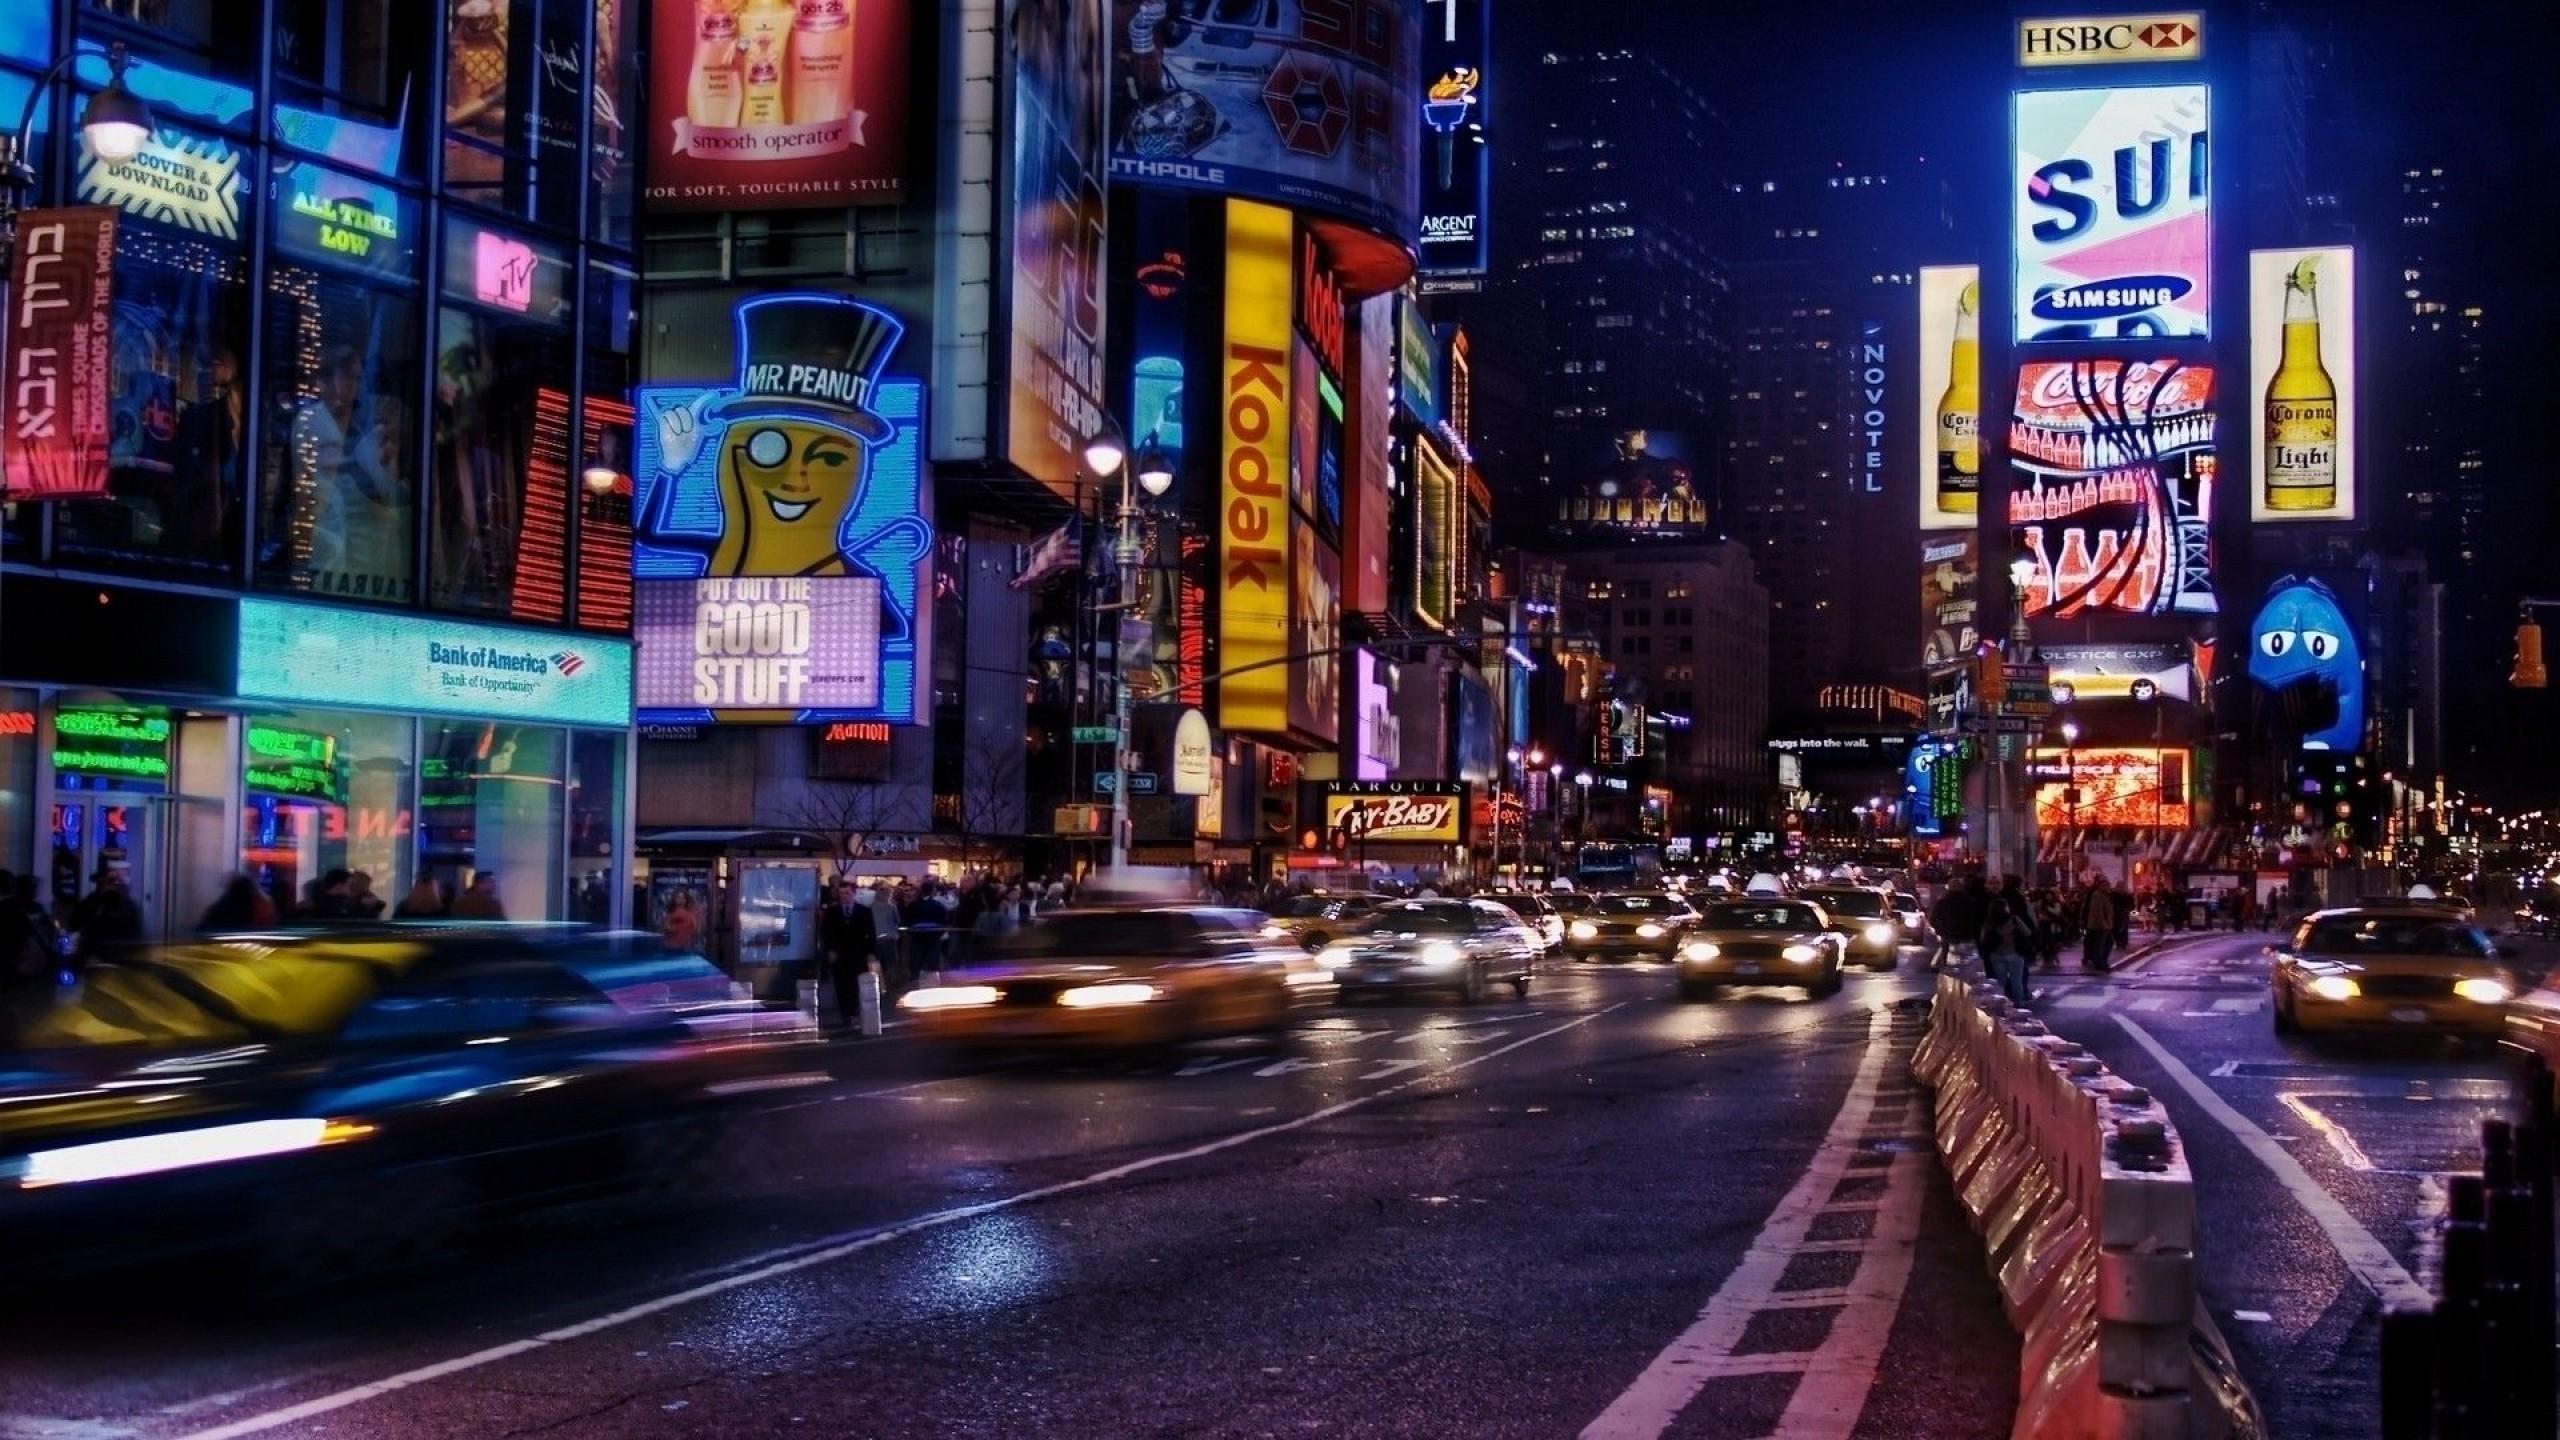 New York City Streets at Night